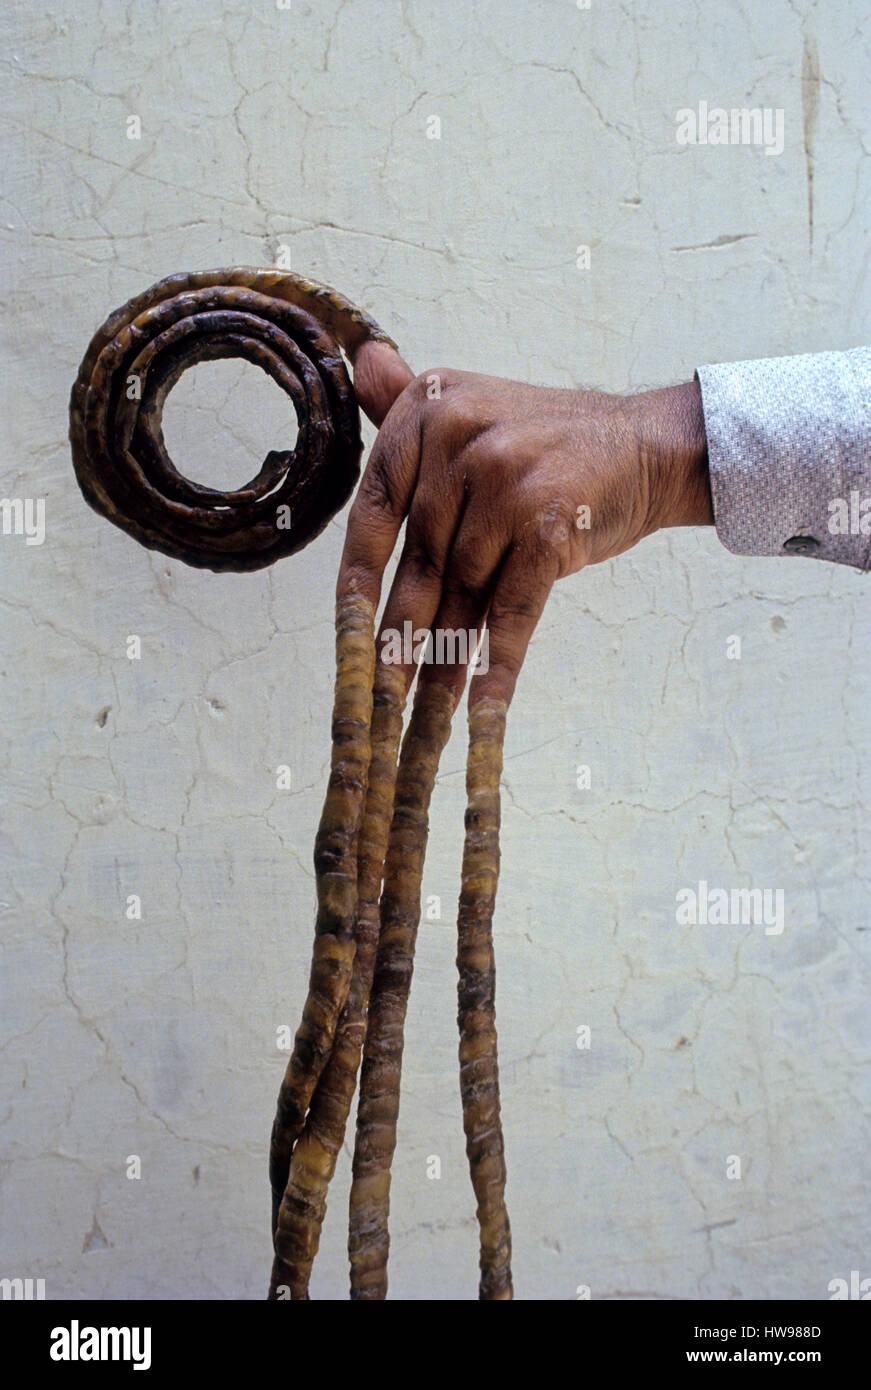 längste Fingernägel Weltrekord Indien Stockfoto, Bild: 136043053 - Alamy